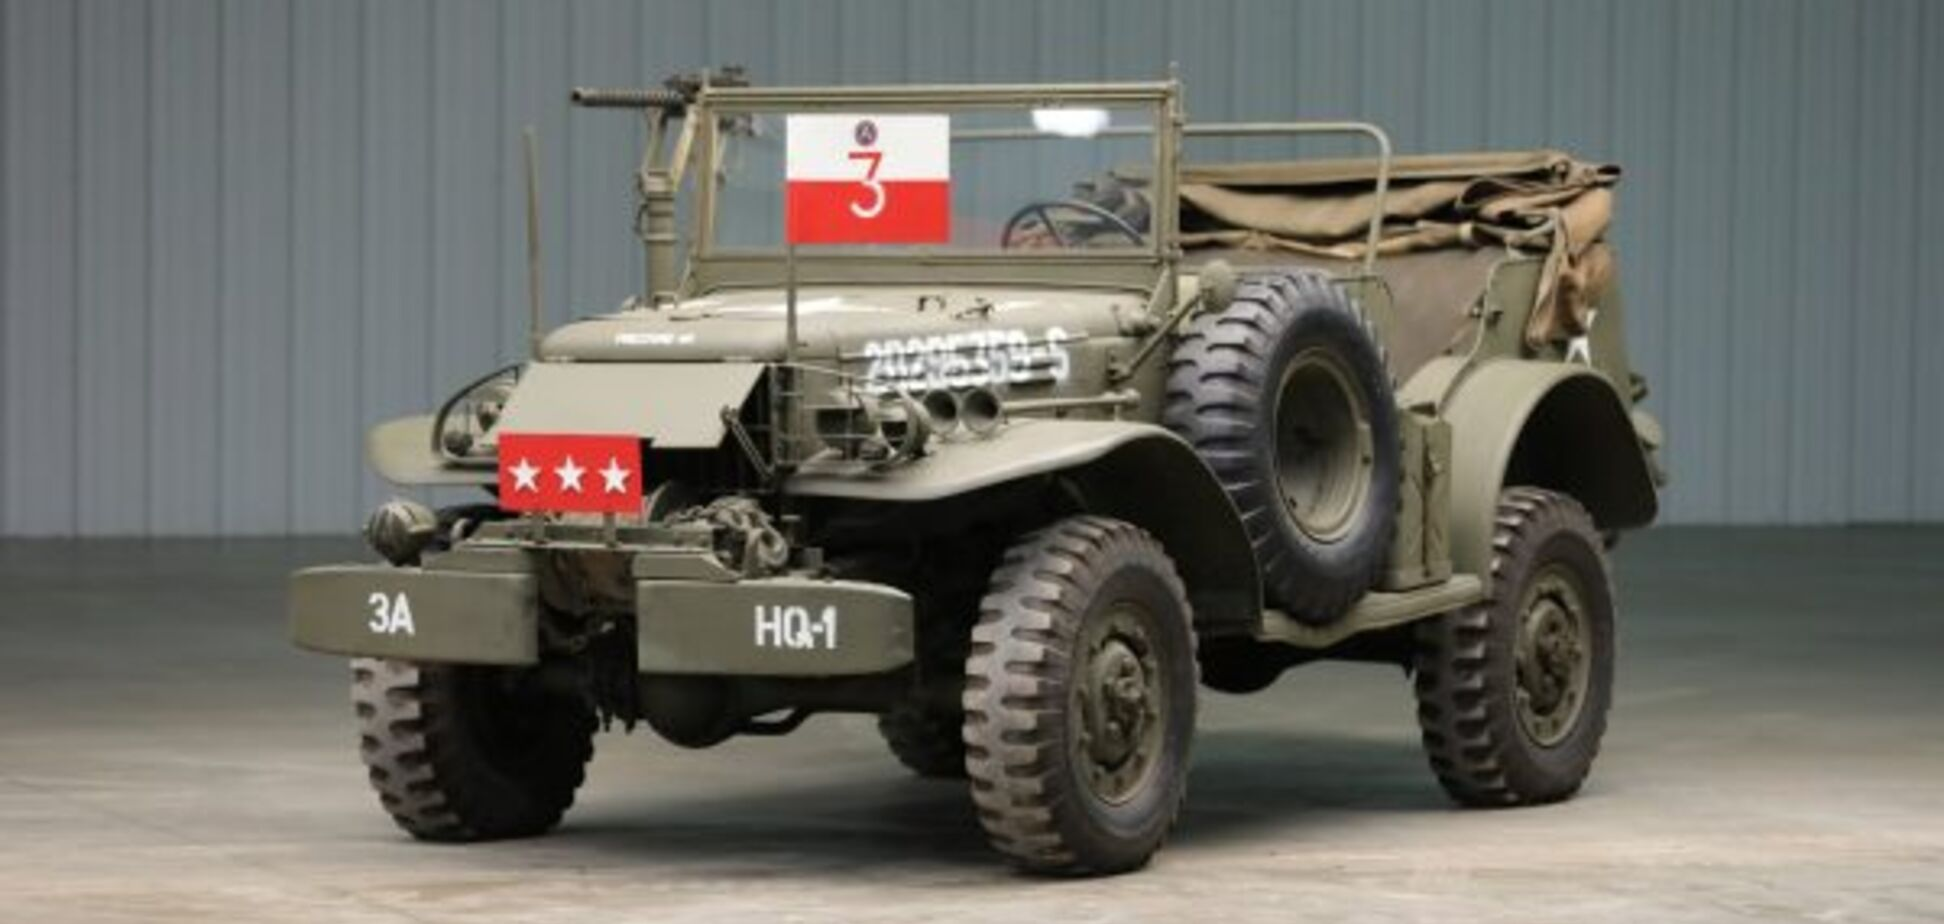 Армійський позашляховик генерала Паттона продадуть з аукціону